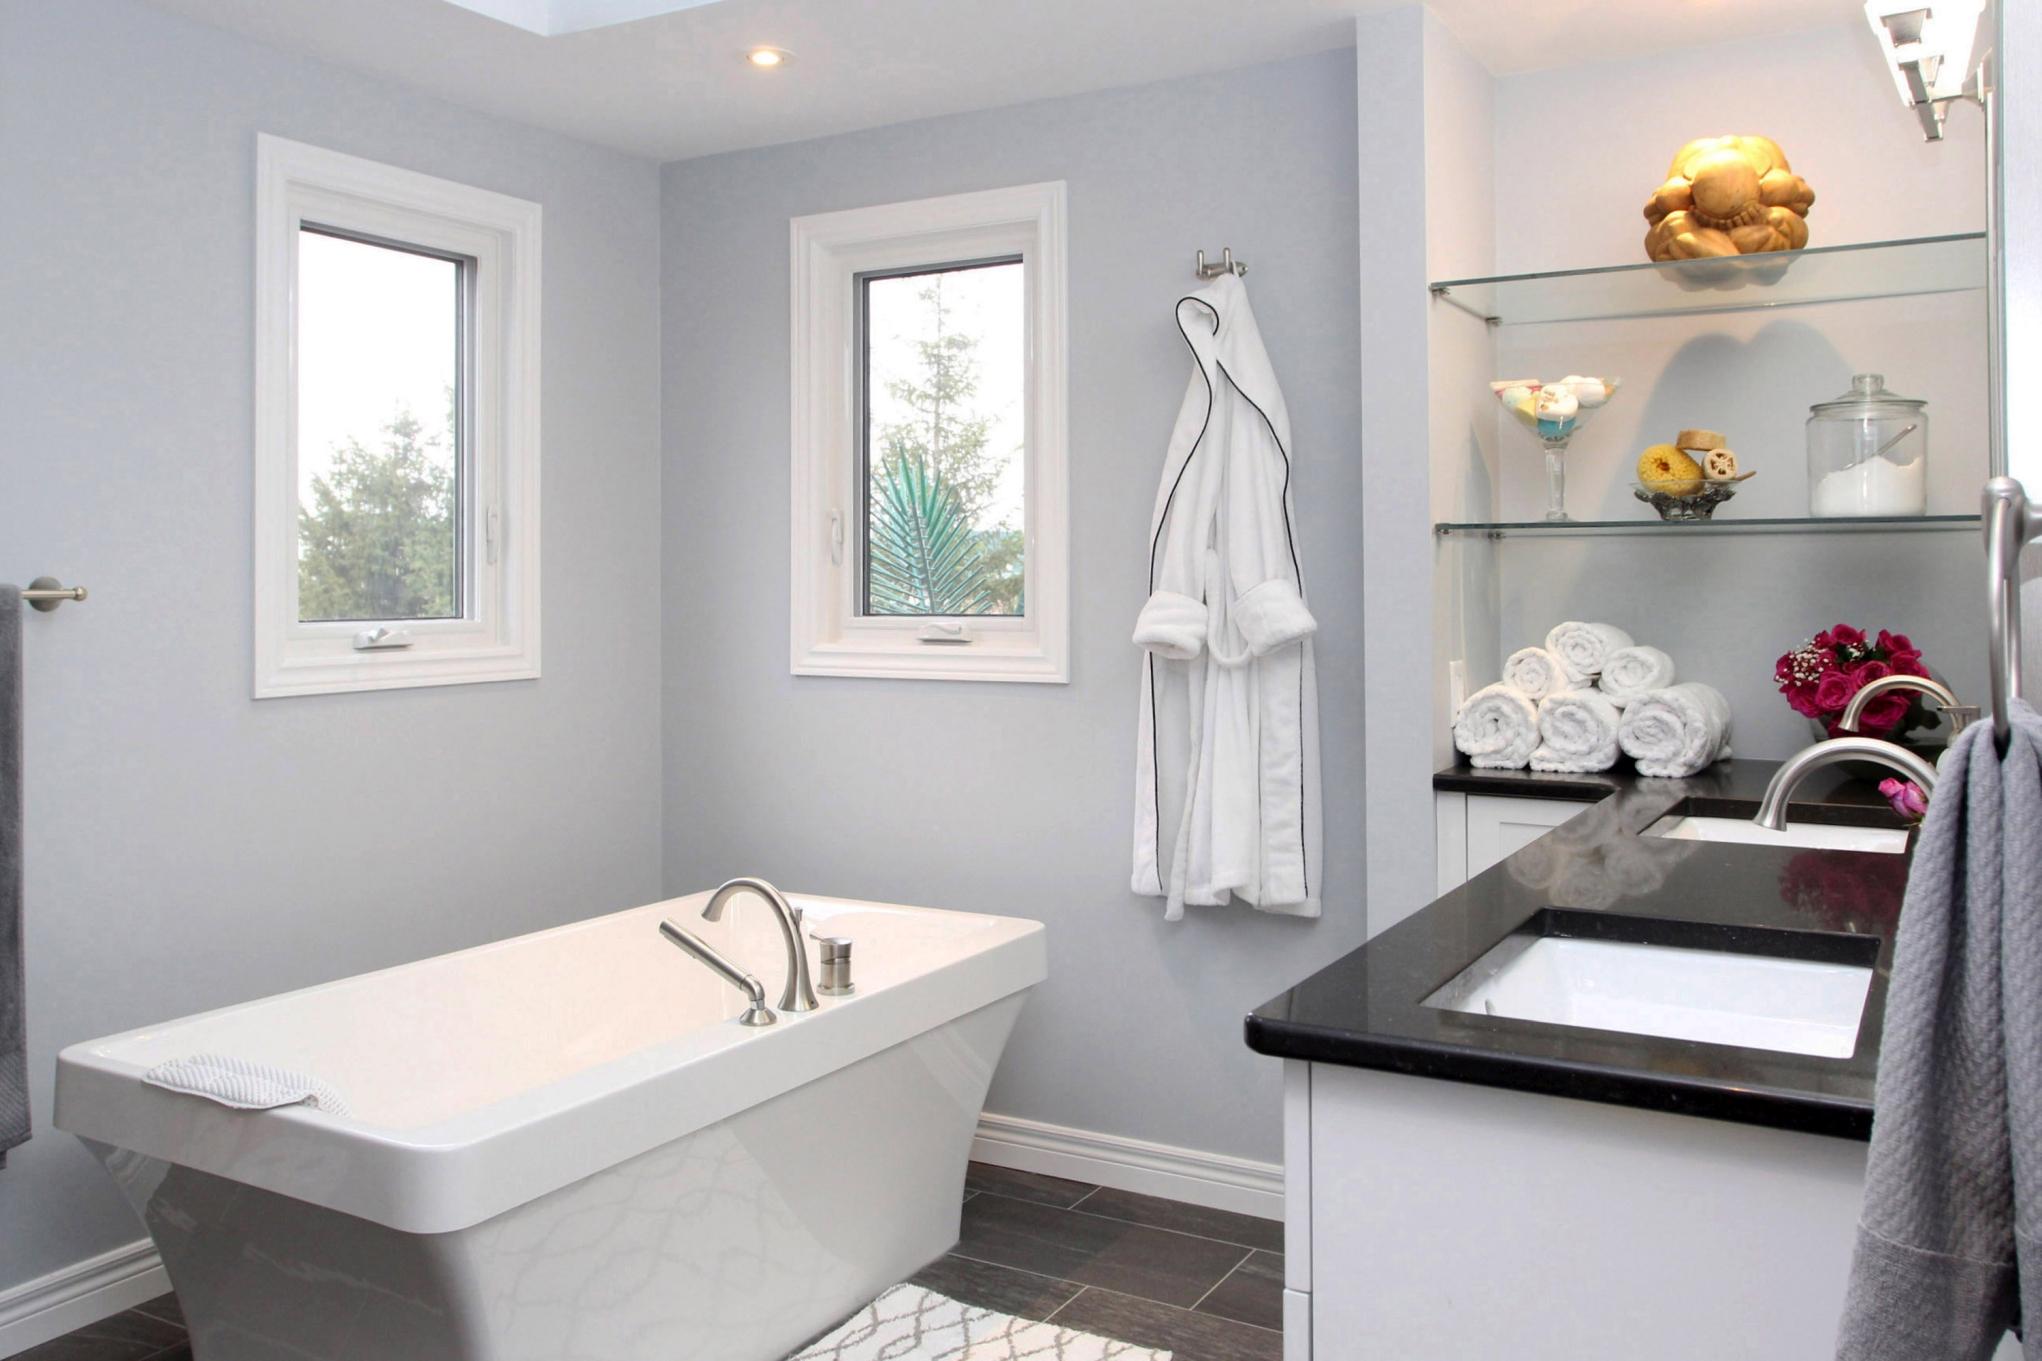 Ensuite Bathroom Guelph bathroom renovations